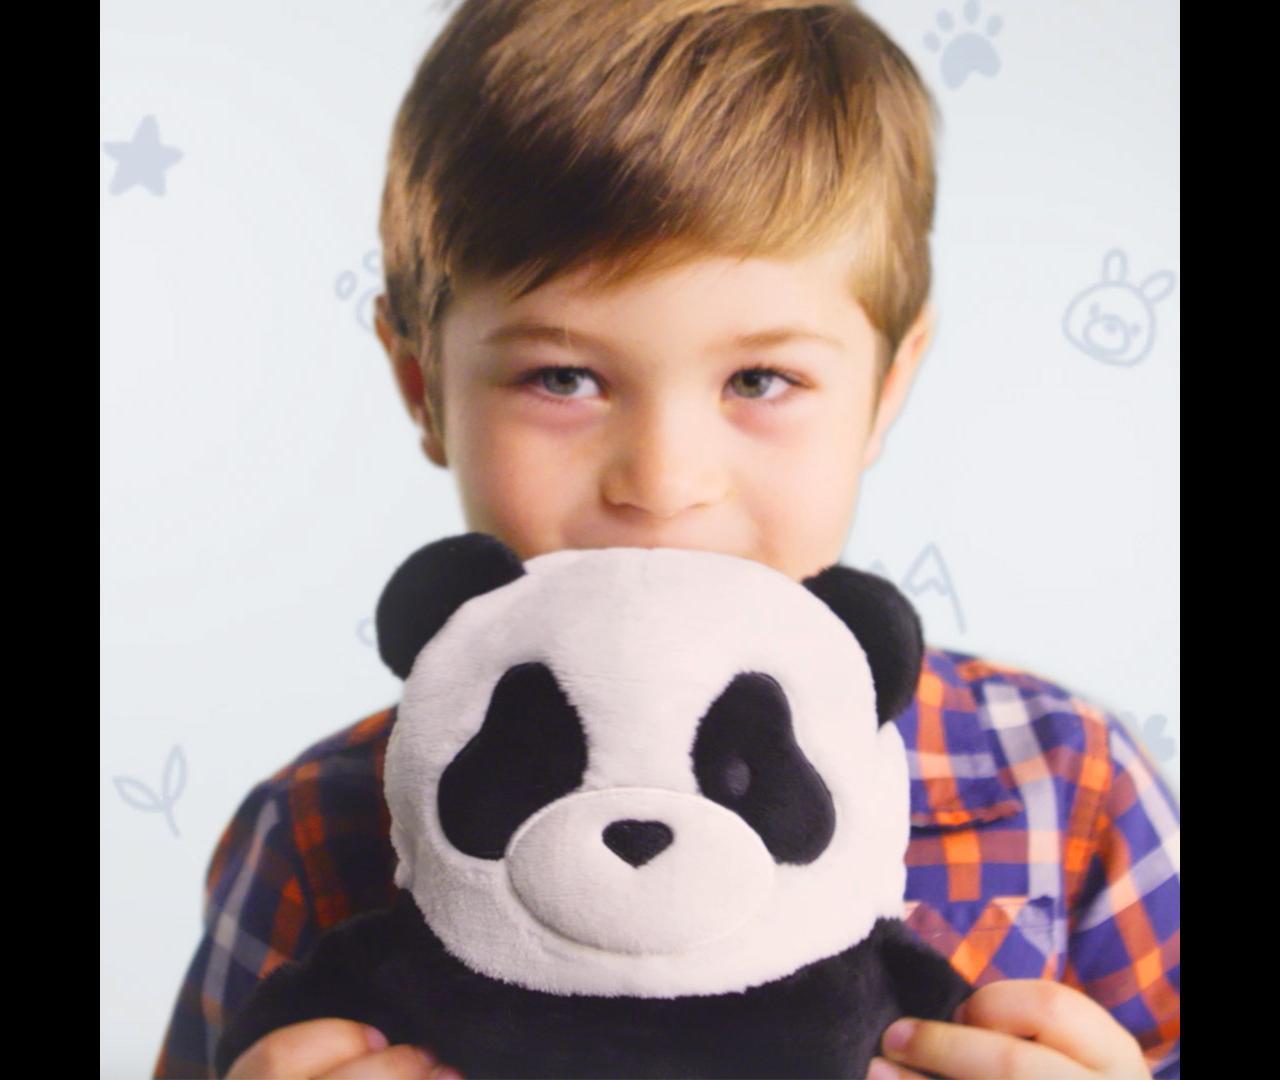 Celebrity kids love these $45 sweatshirts-turned-stuffed animals